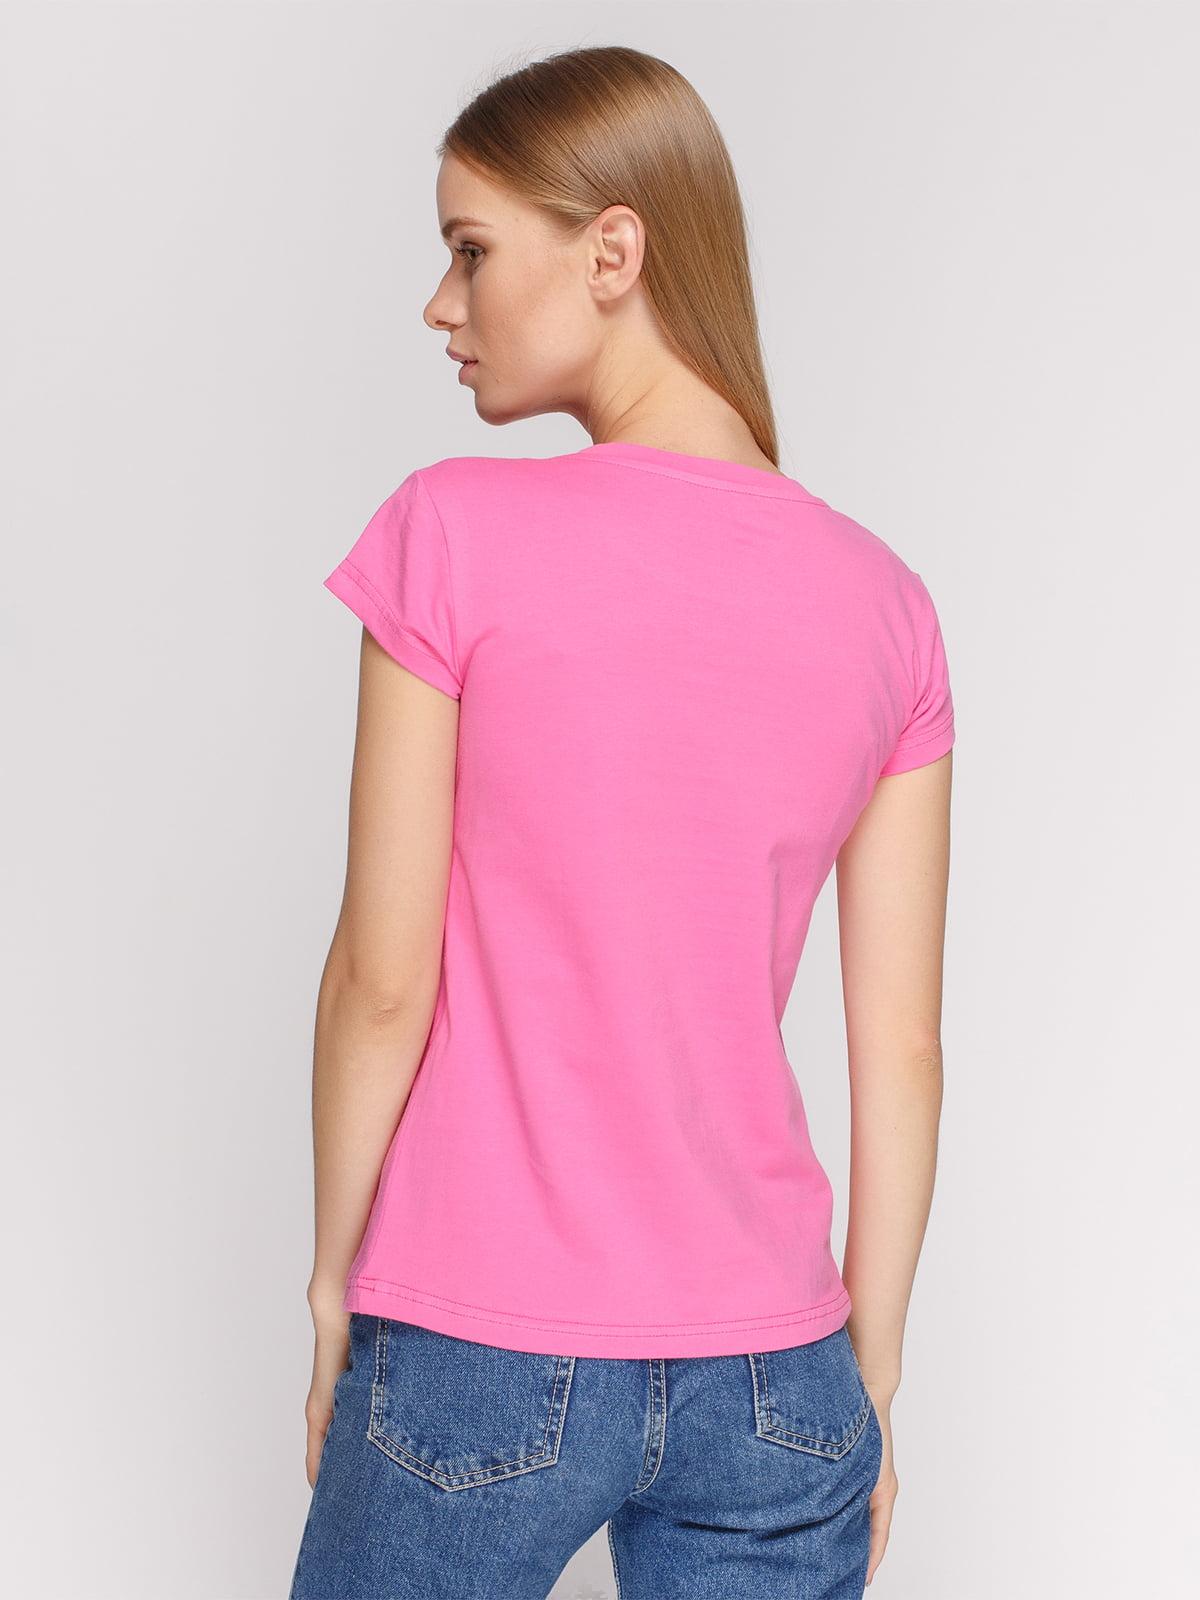 Футболка рожева з принтом | 4578078 | фото 2